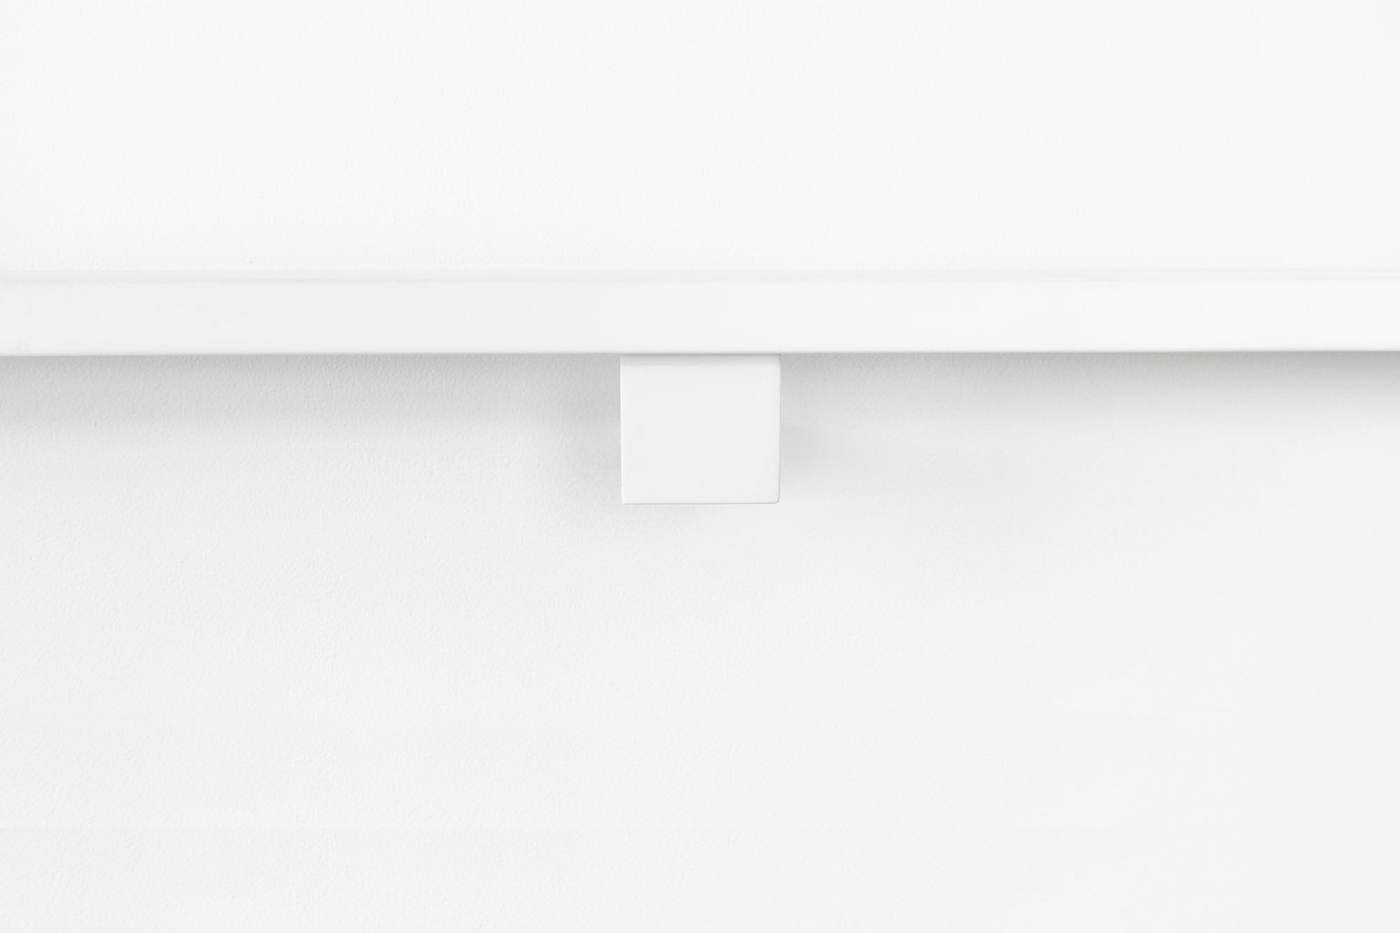 Contemporary-white-rail-with-white-handrail-bracket